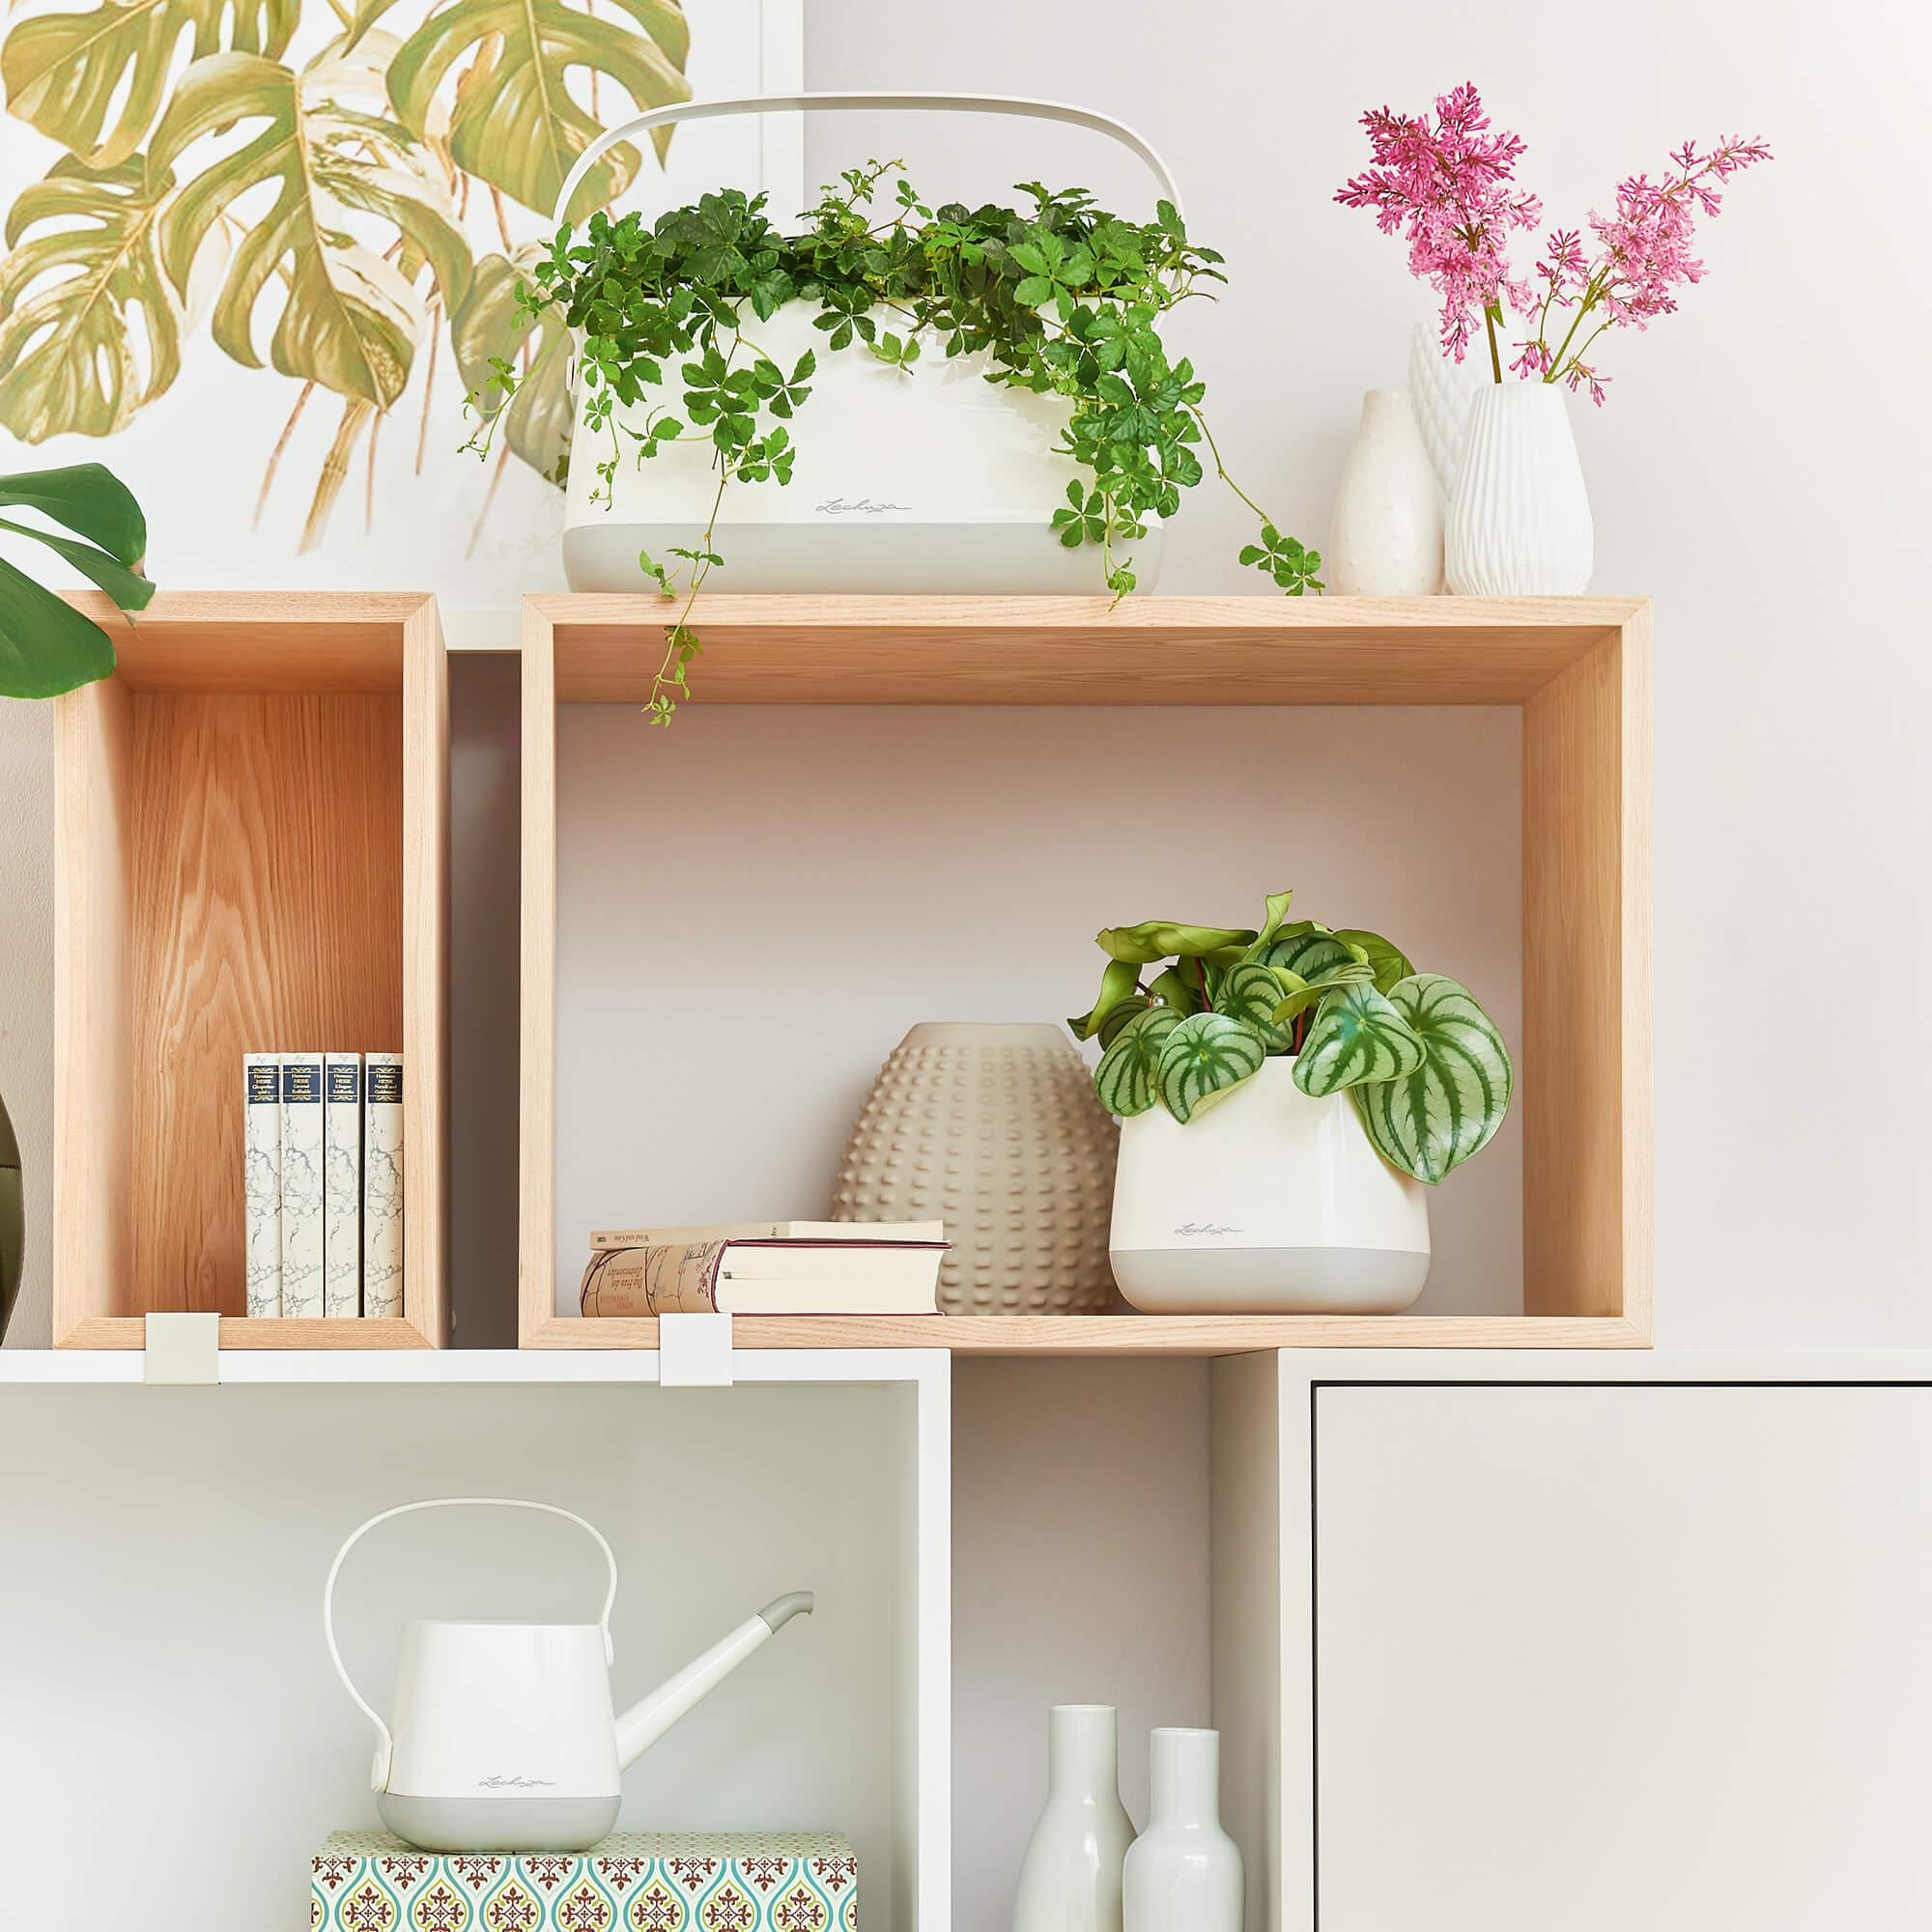 YULA planter white/gray semi-gloss - Image 8